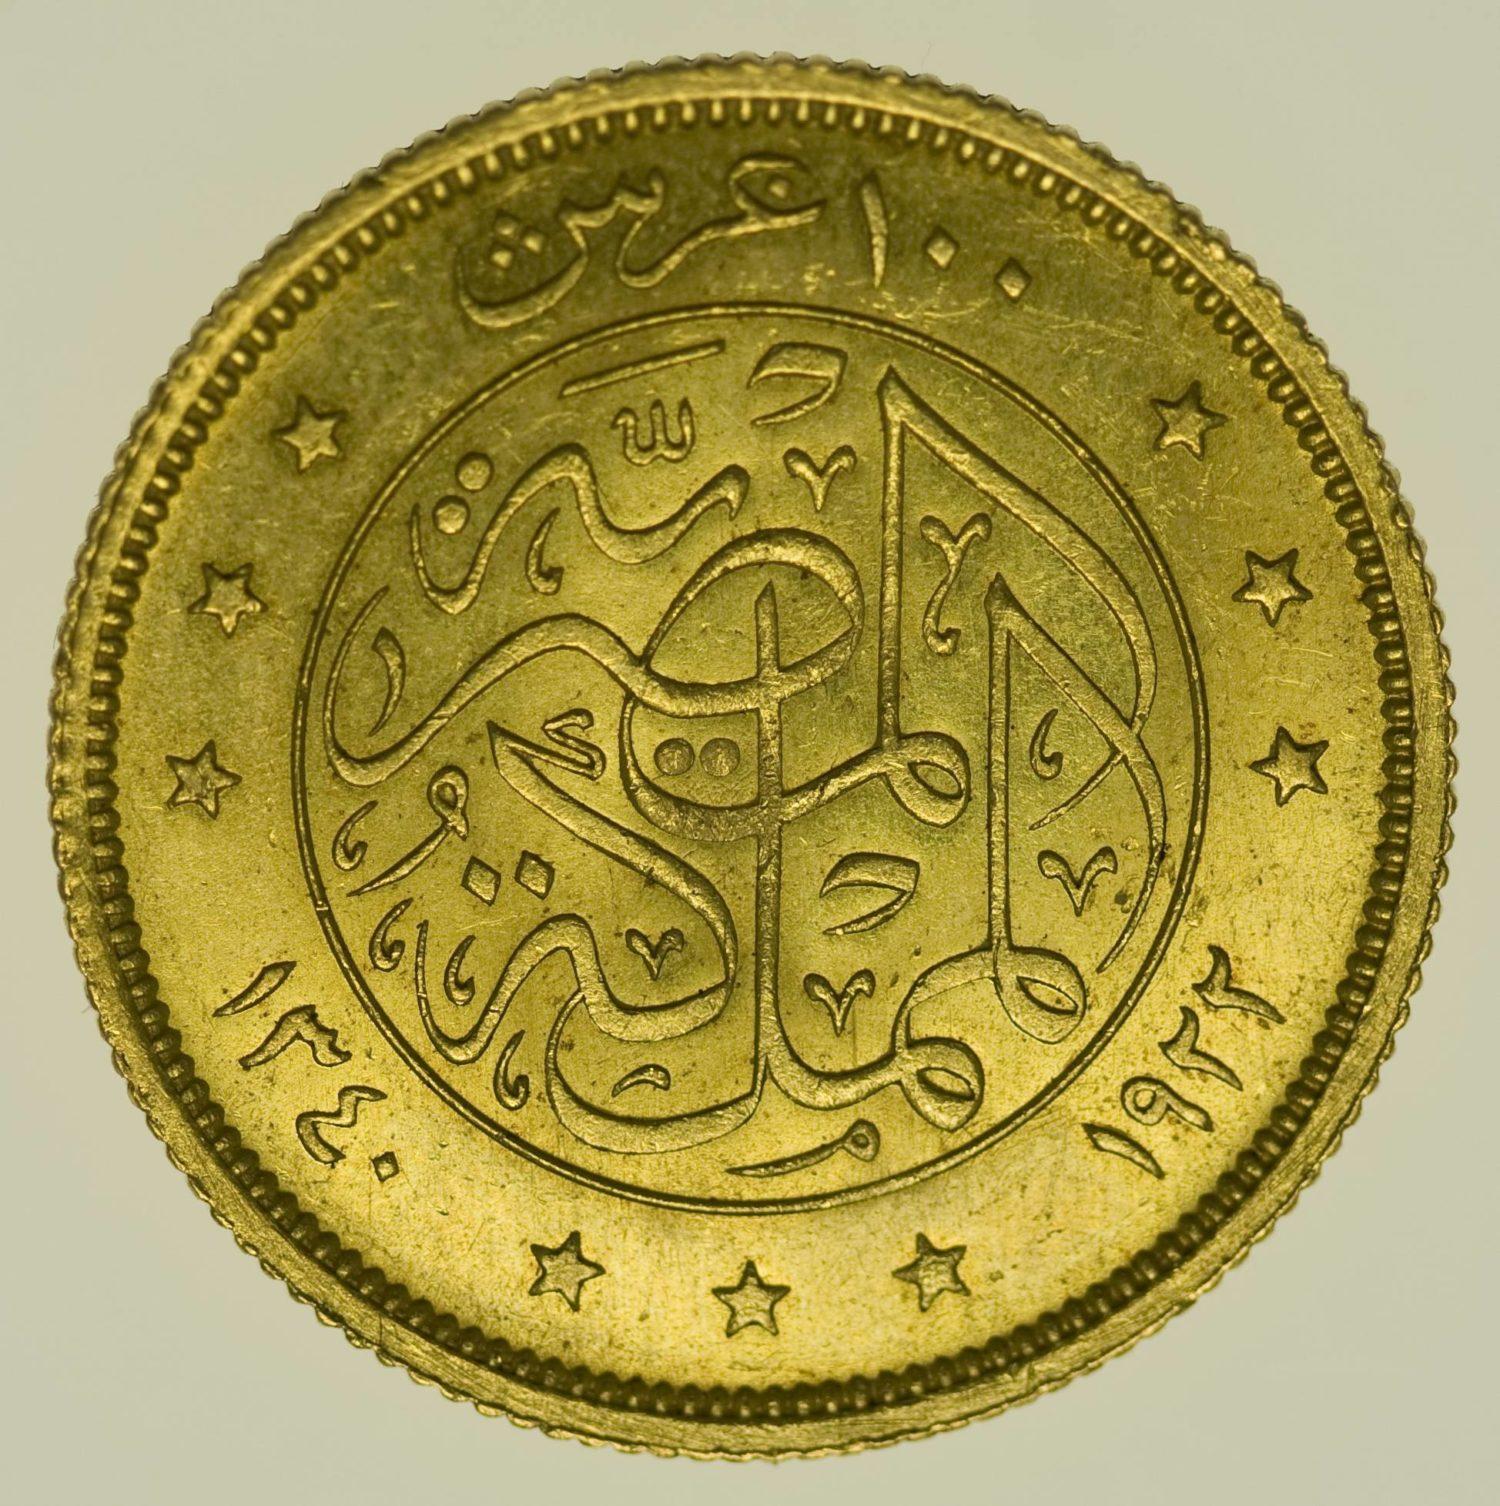 aegypten - Ägypten Fuad I. 100 Piaster 1922